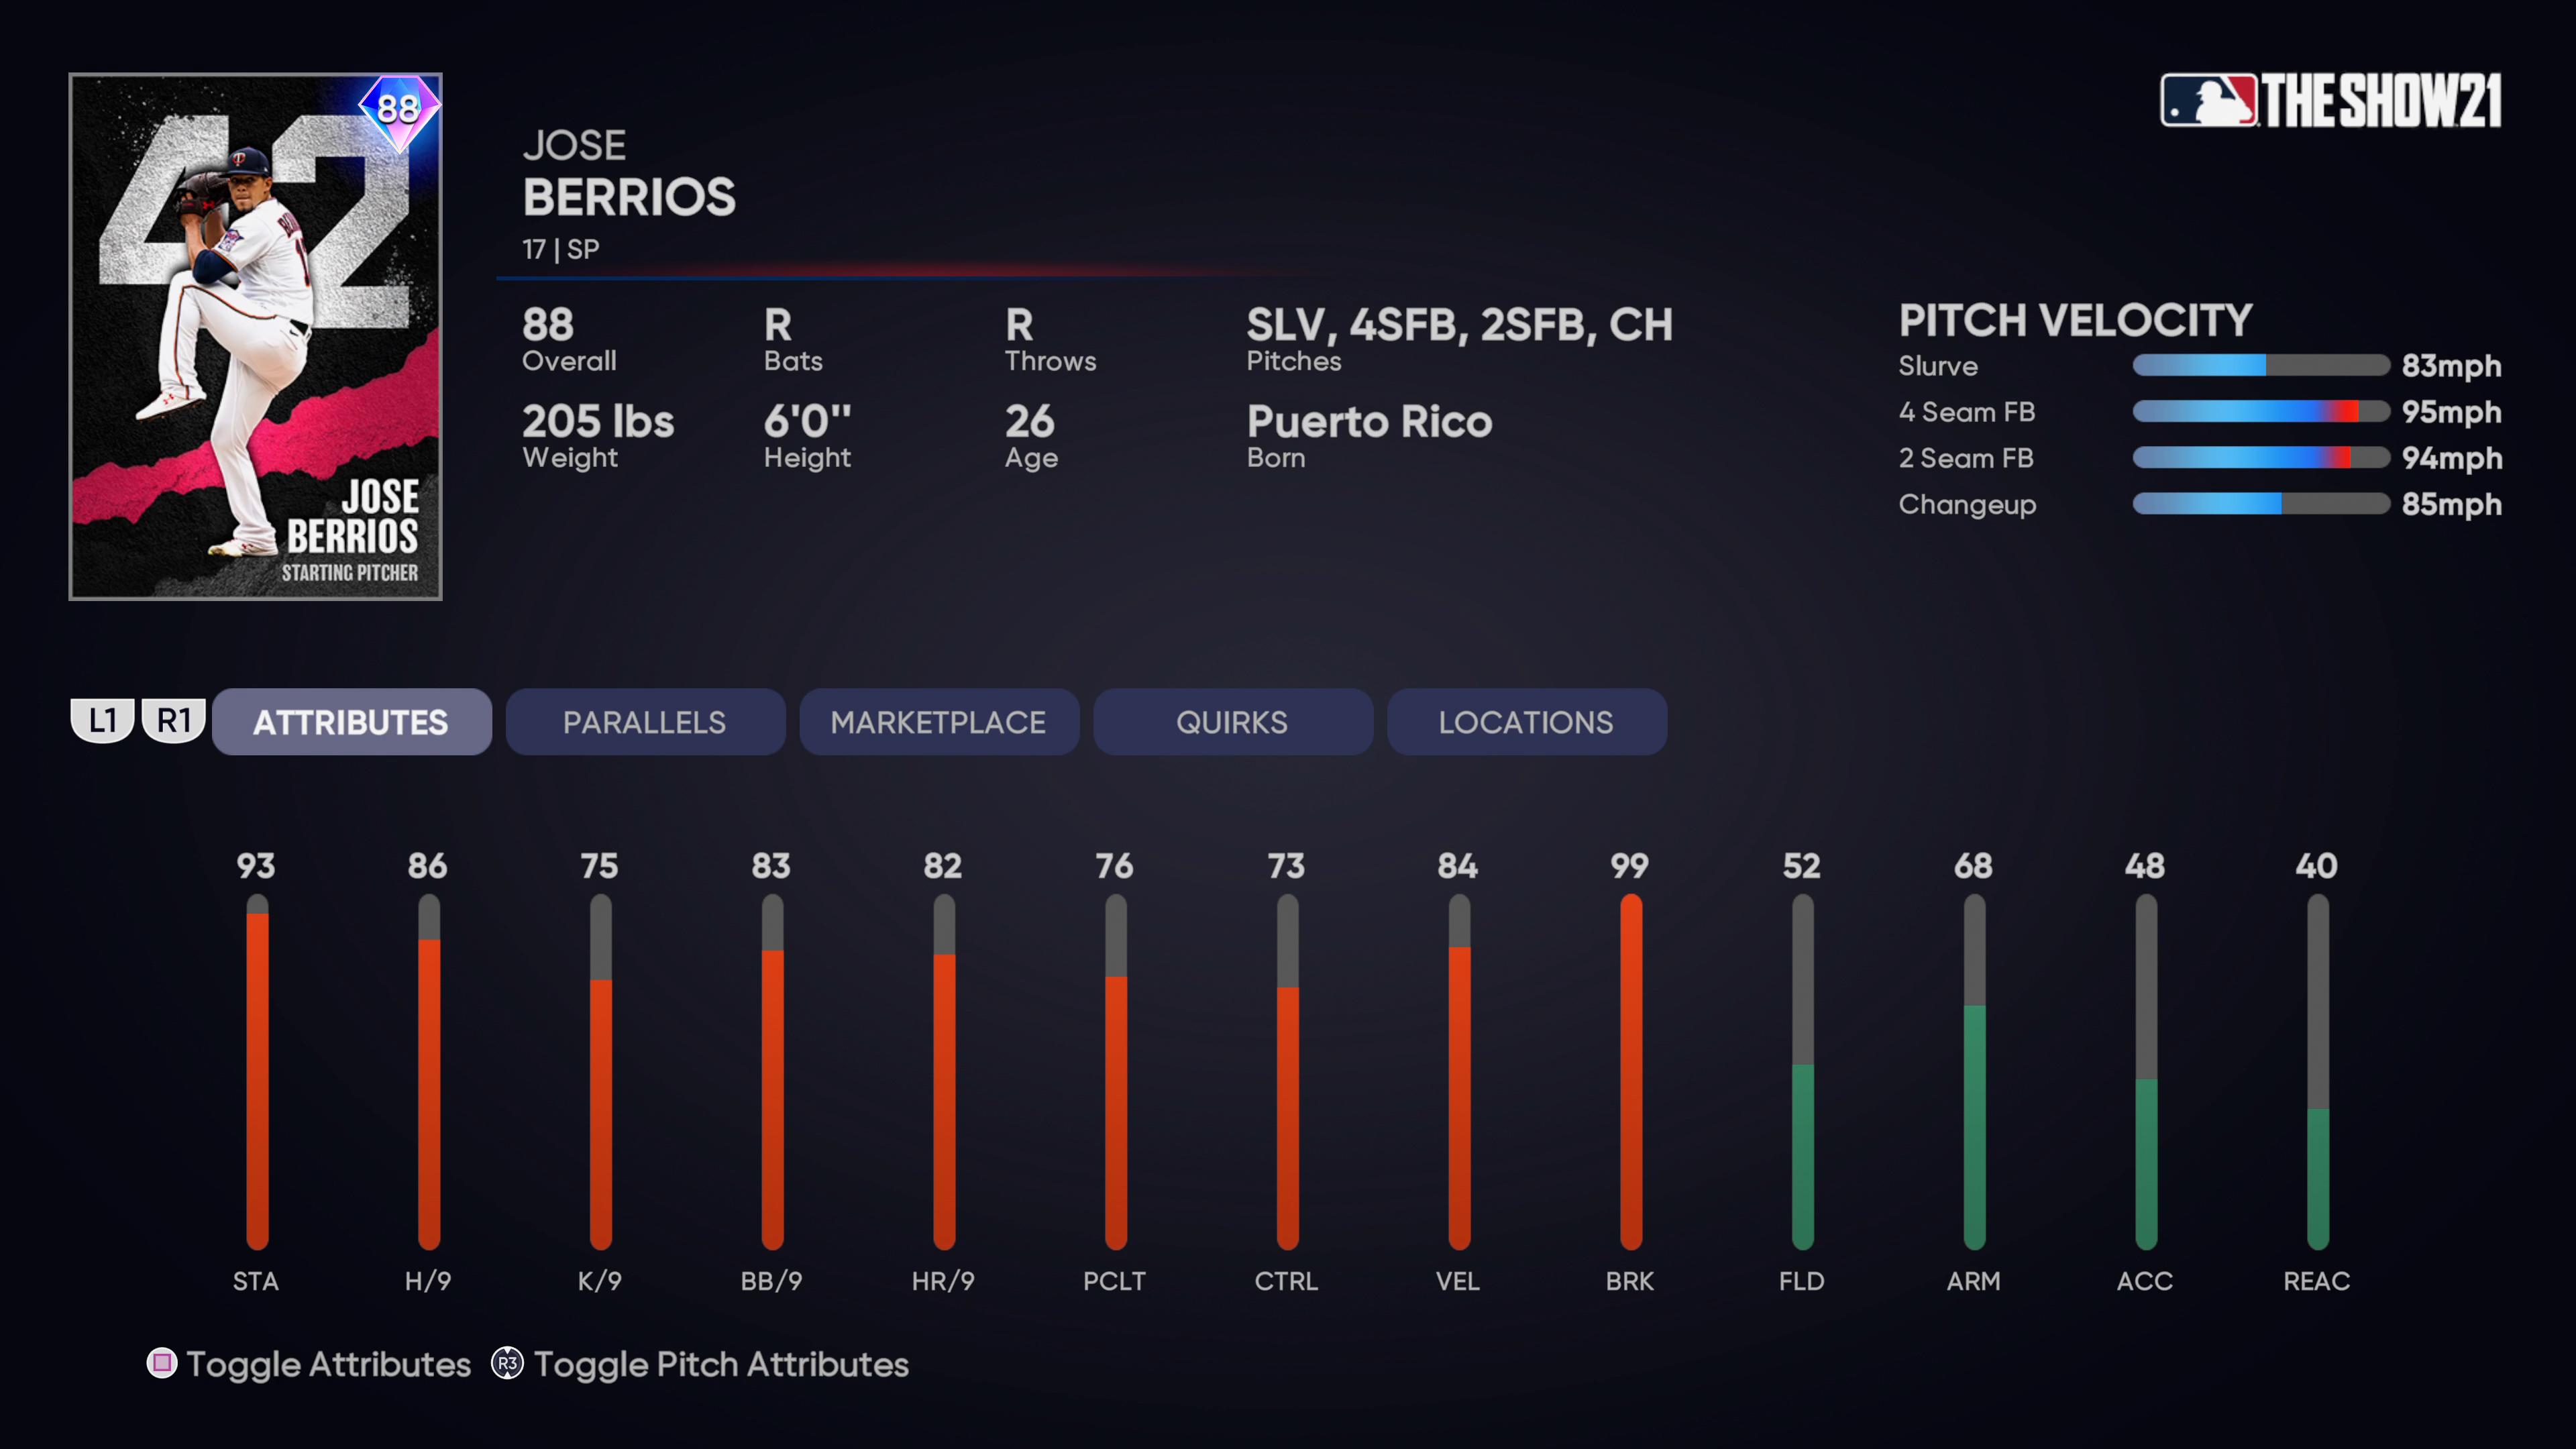 MLB The Show 21 - Jose Berrios_2021-04-17_02-37-12